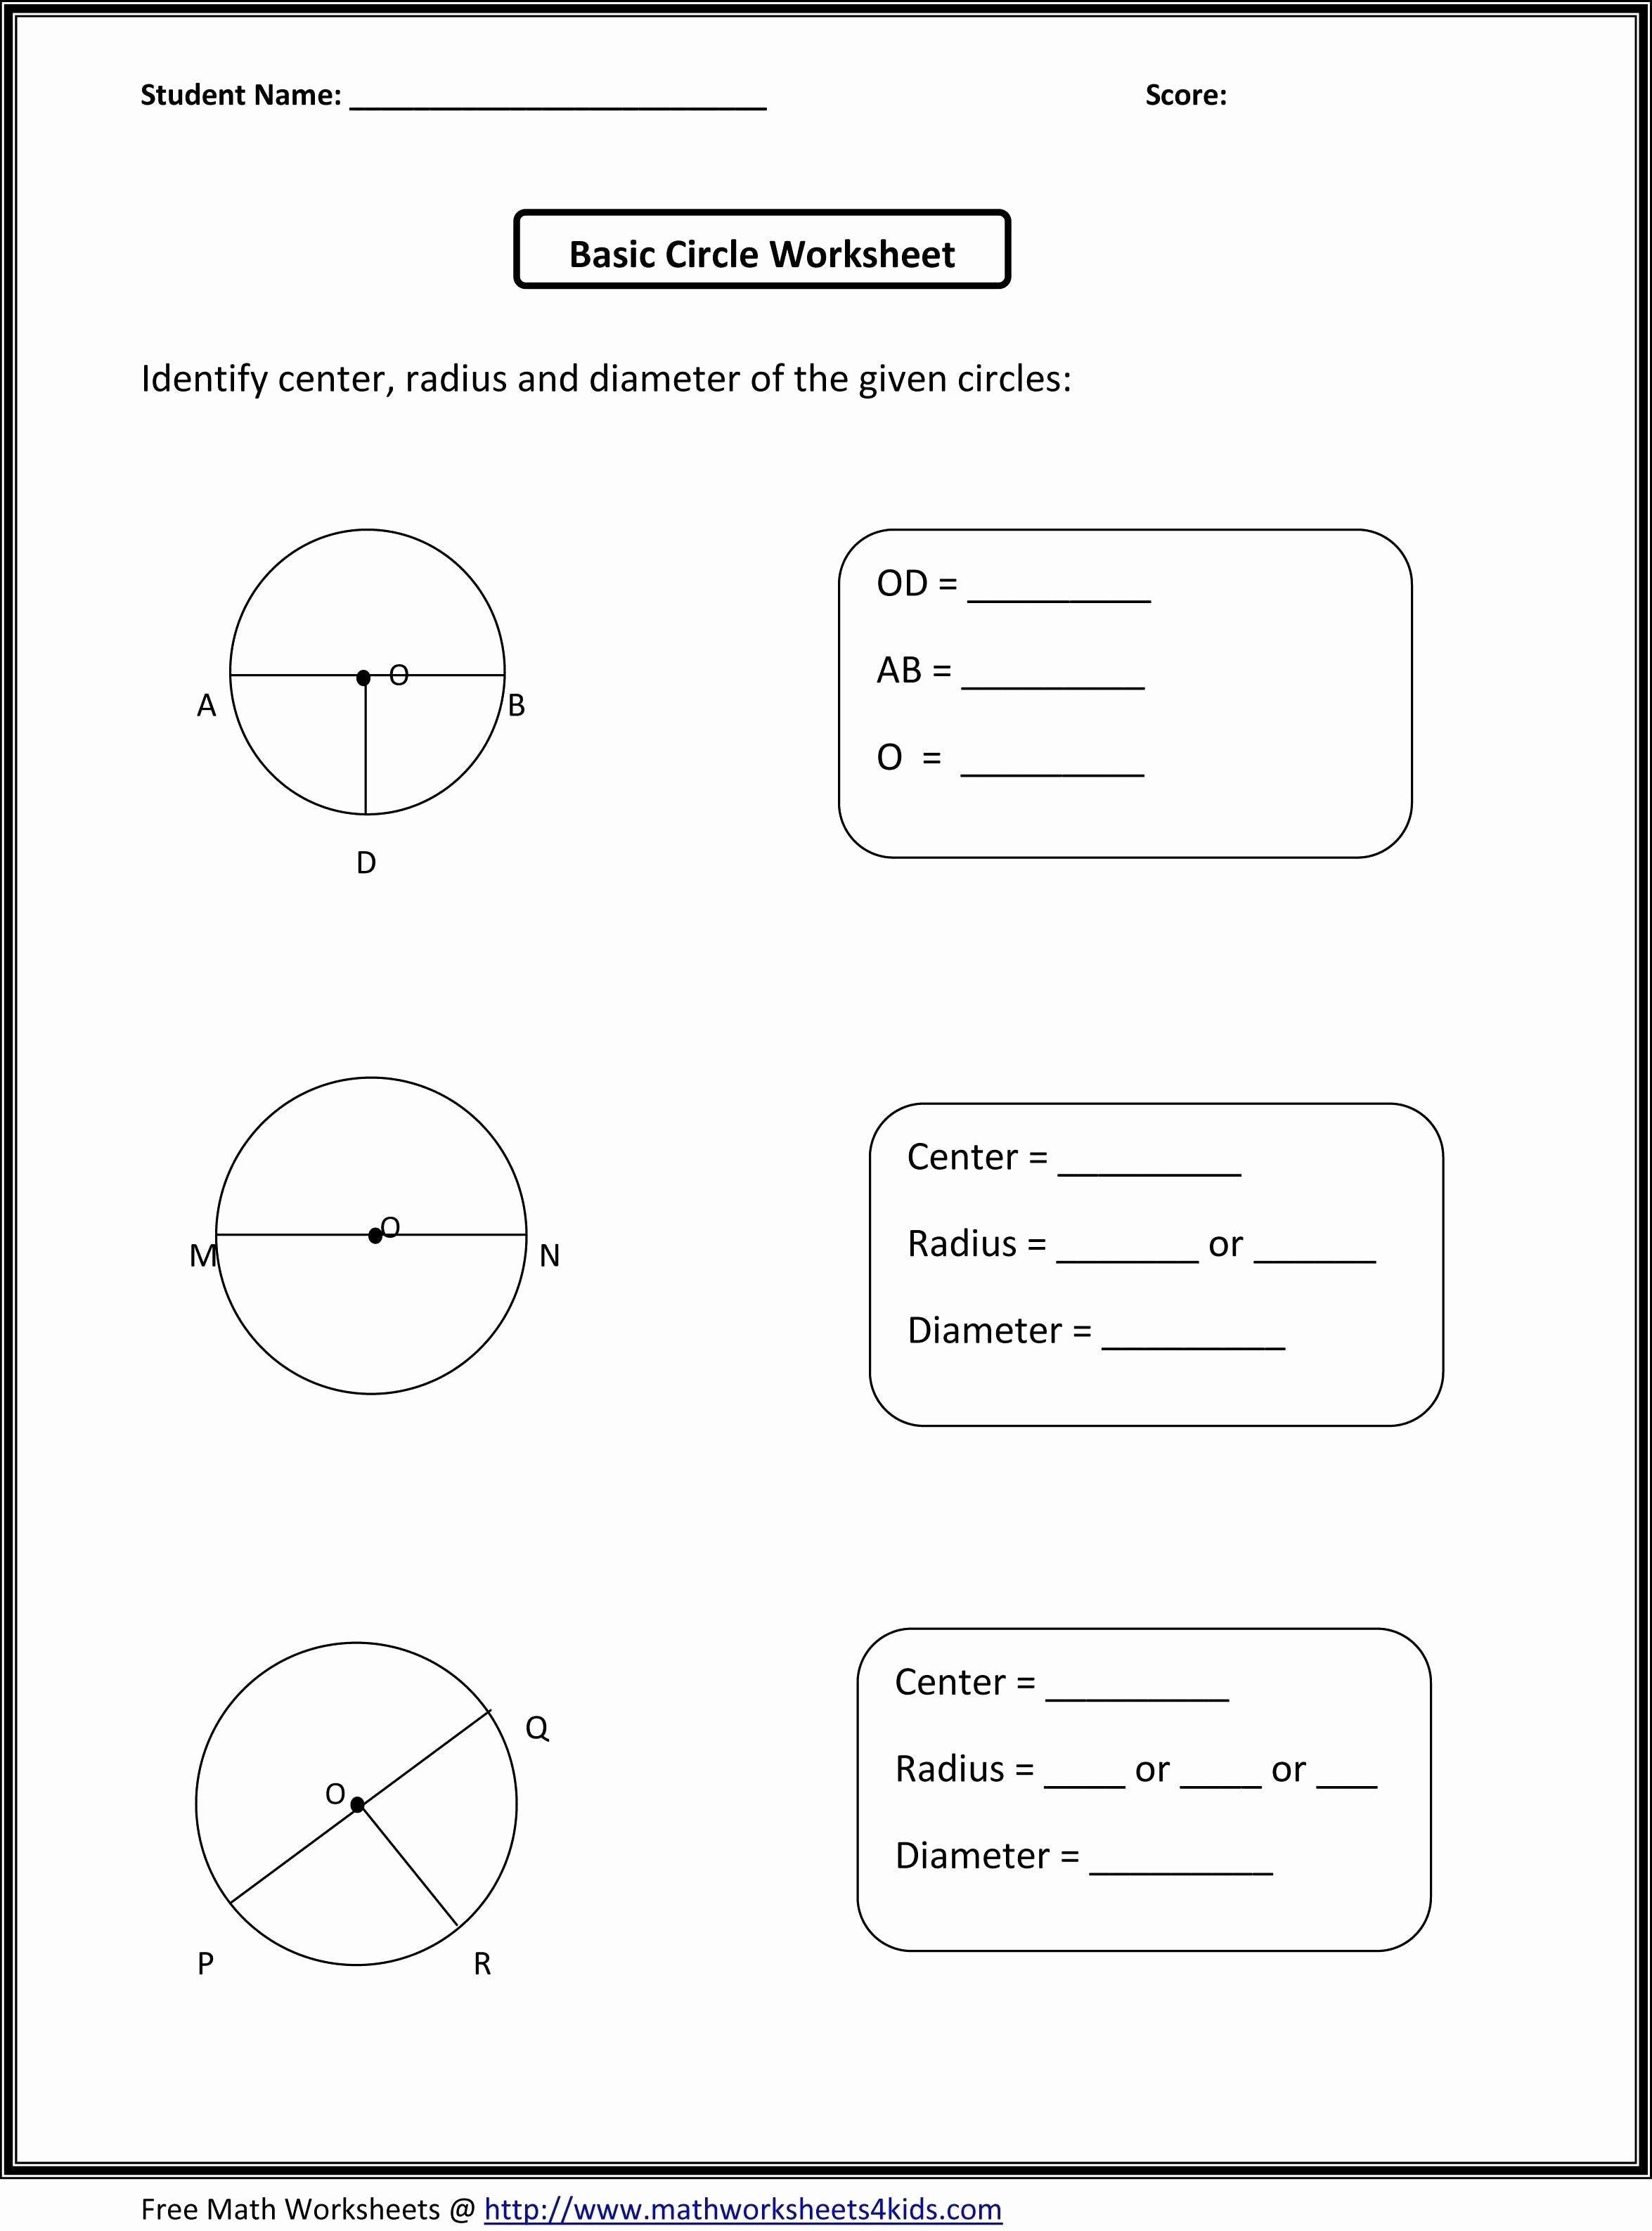 Linear Inequalities Word Problems Worksheet Awesome Linear Inequalities Worksheet Worksheet Idea Template